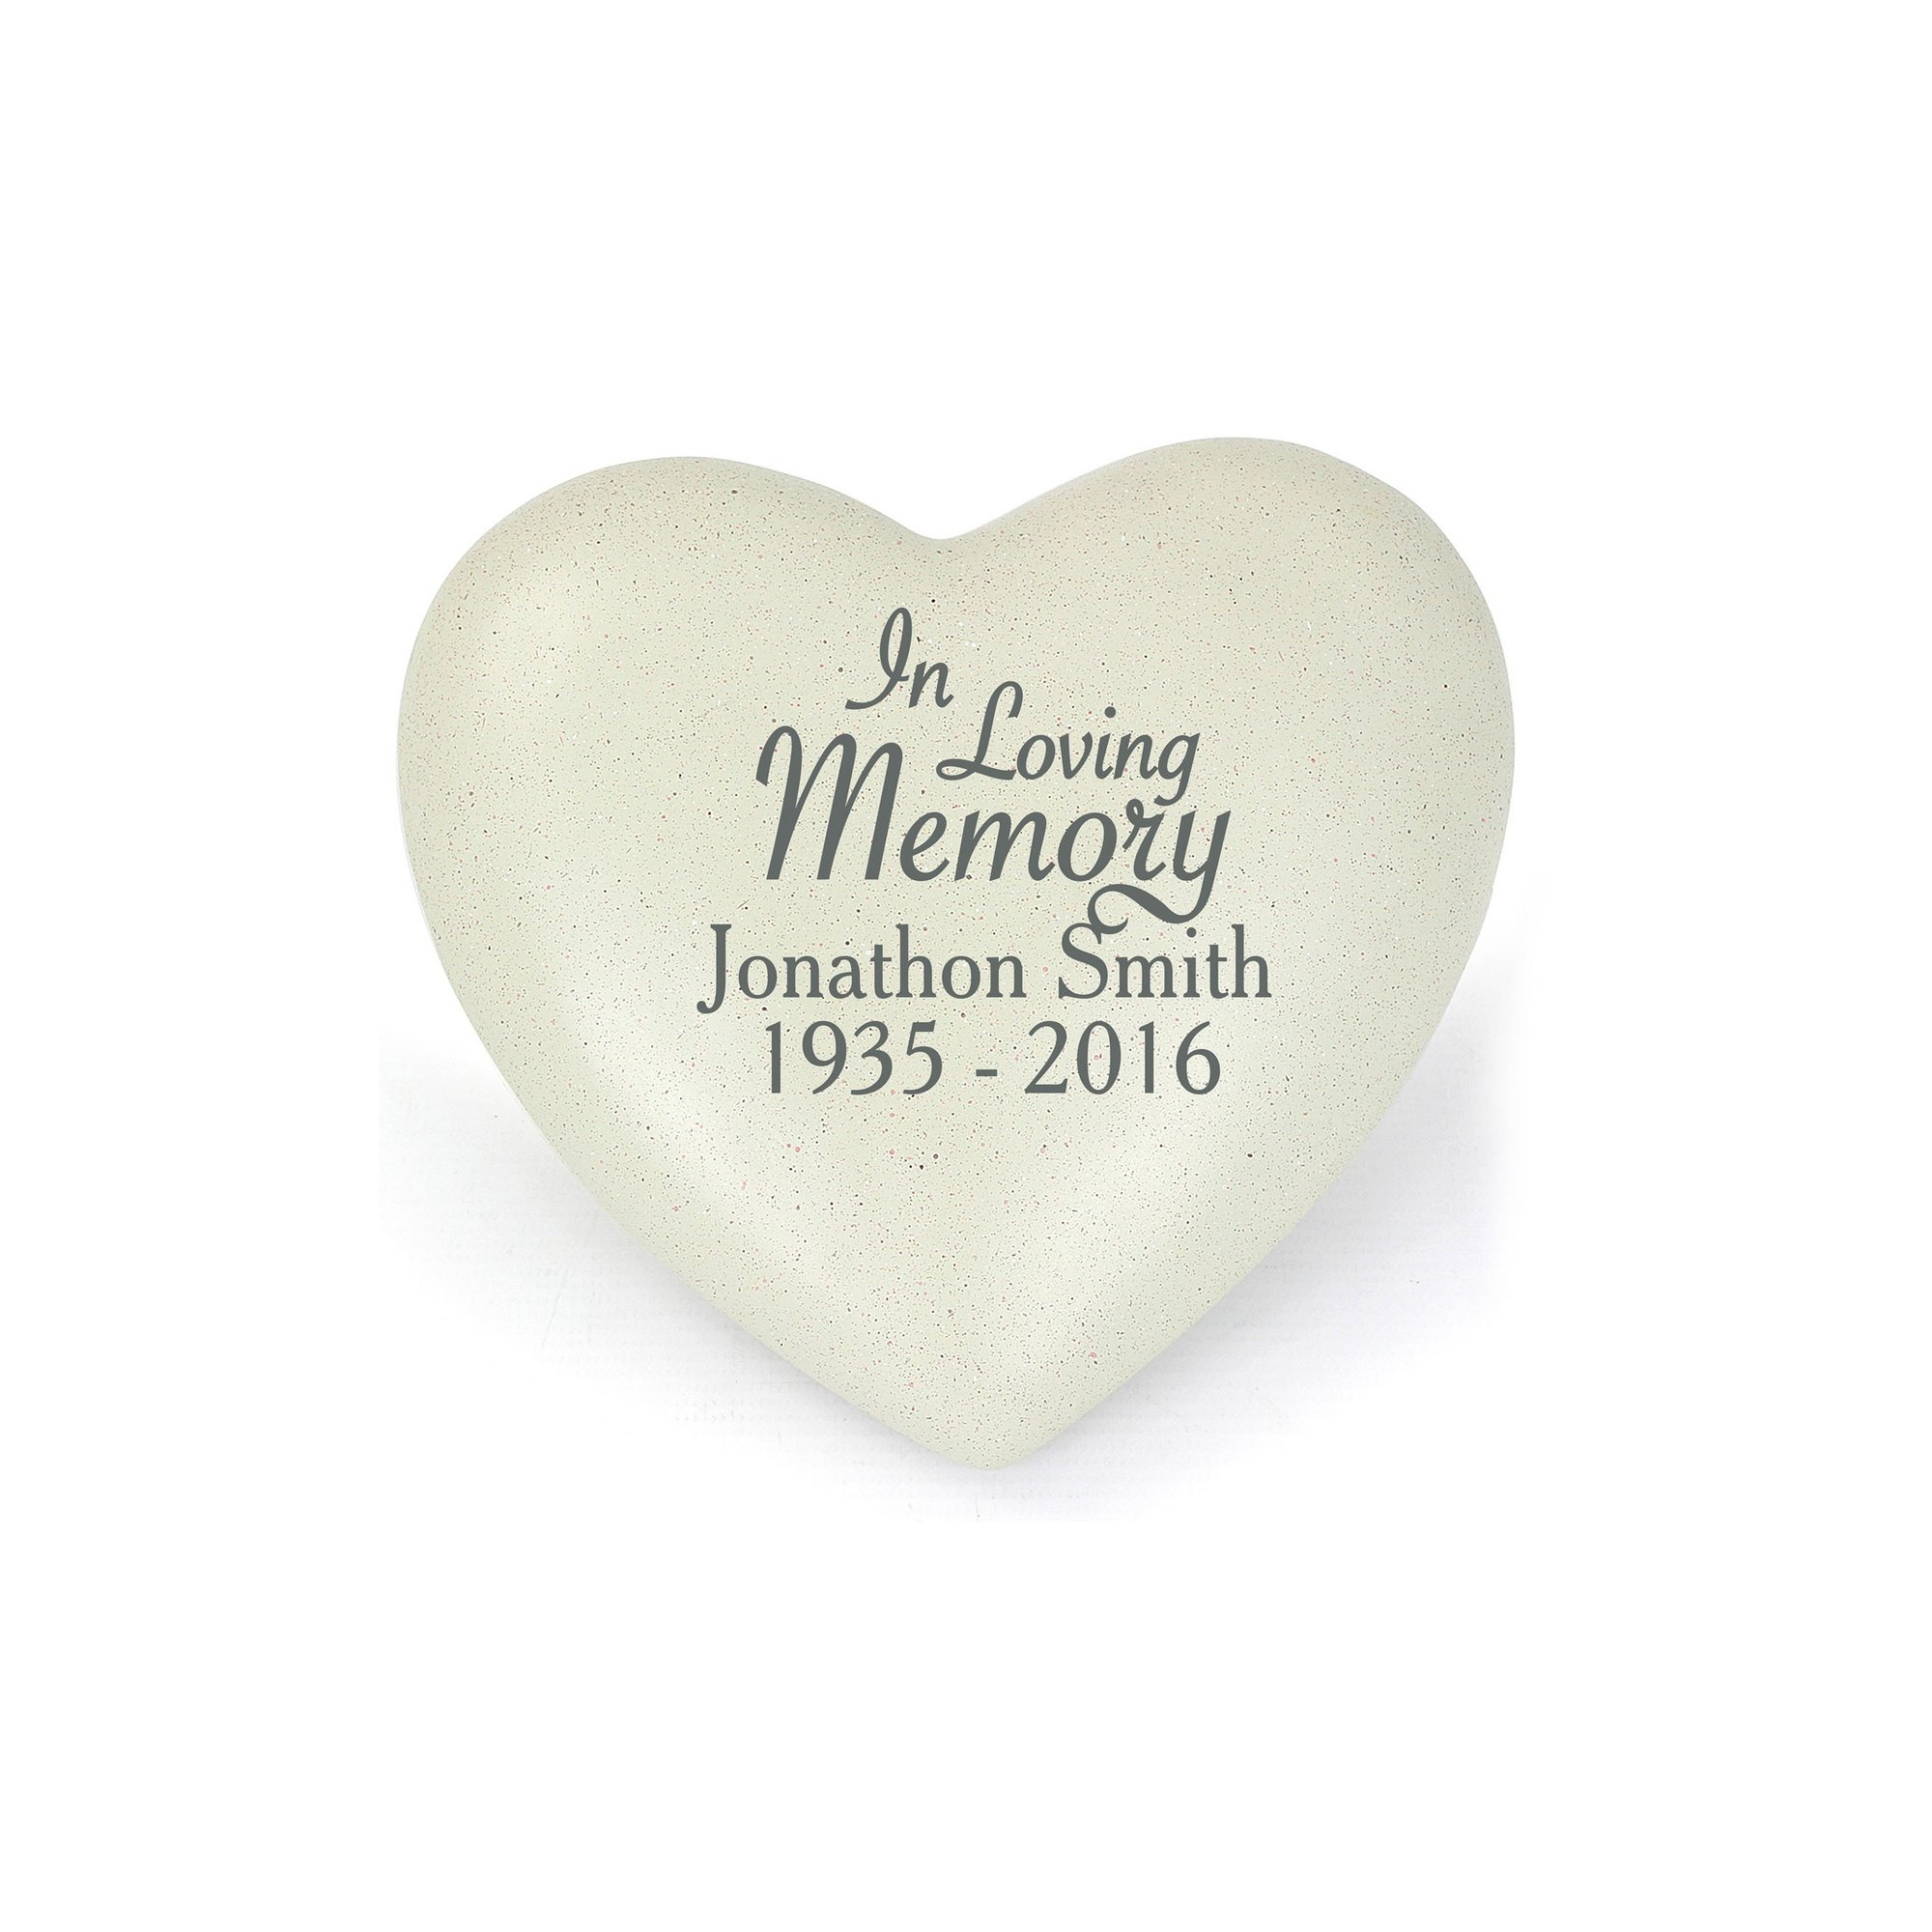 Image of Personalised In Loving Memory Heart Memorial Plaque